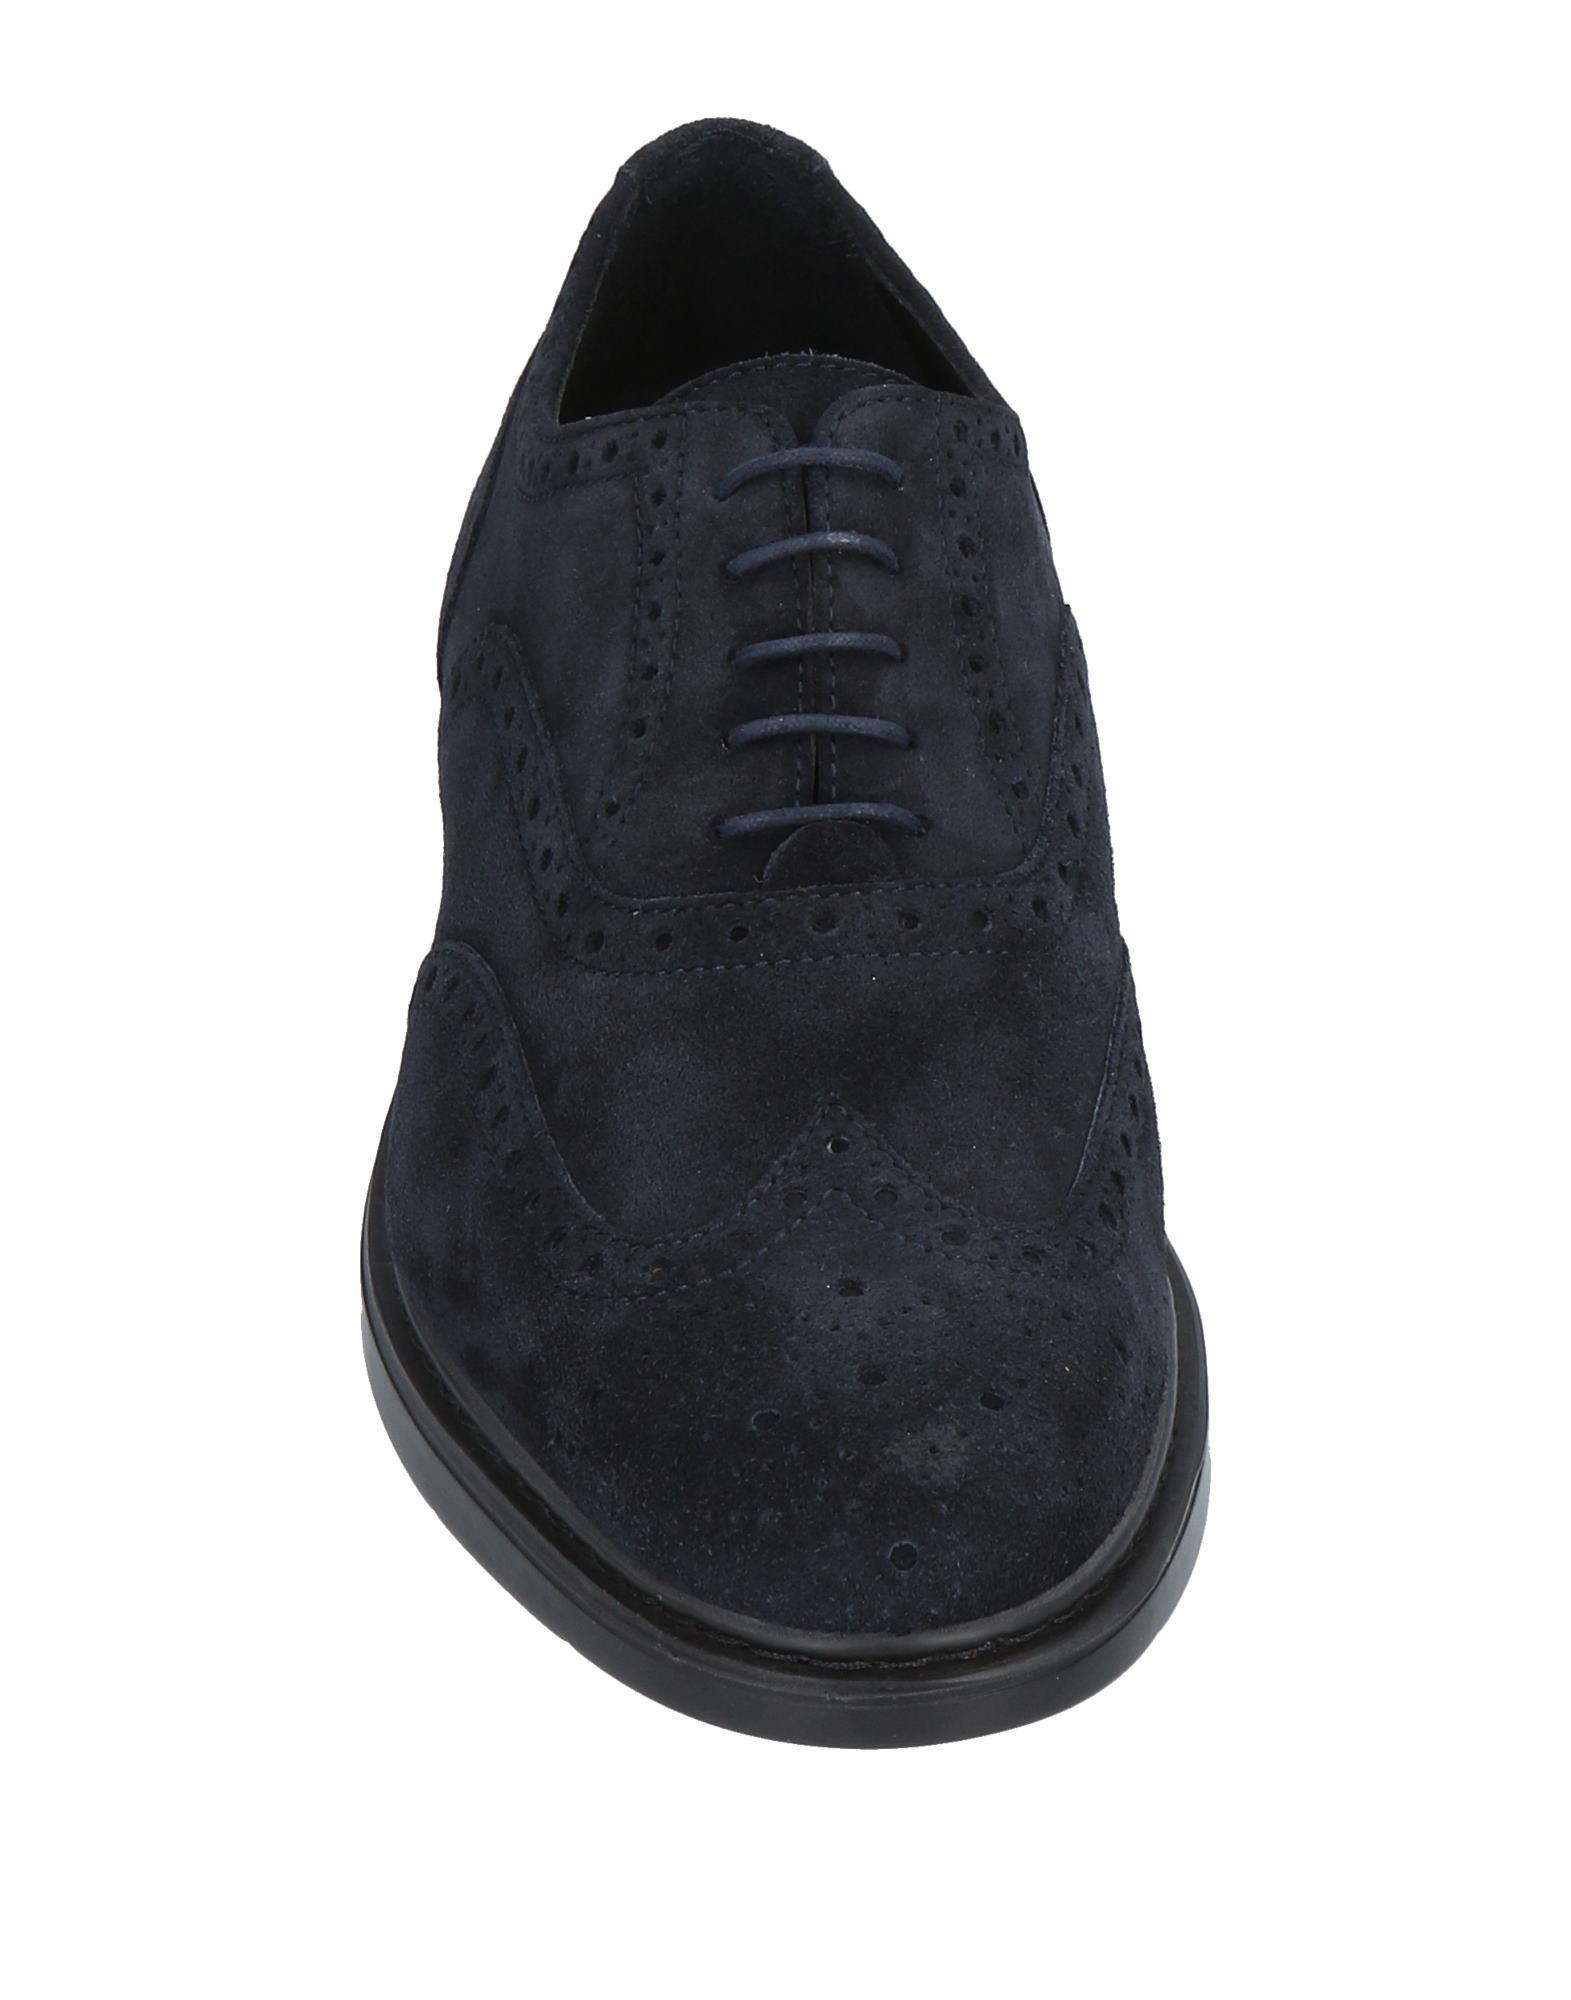 Docksteps Heiße Schnürschuhe Herren  11475076SI Heiße Docksteps Schuhe 50e469